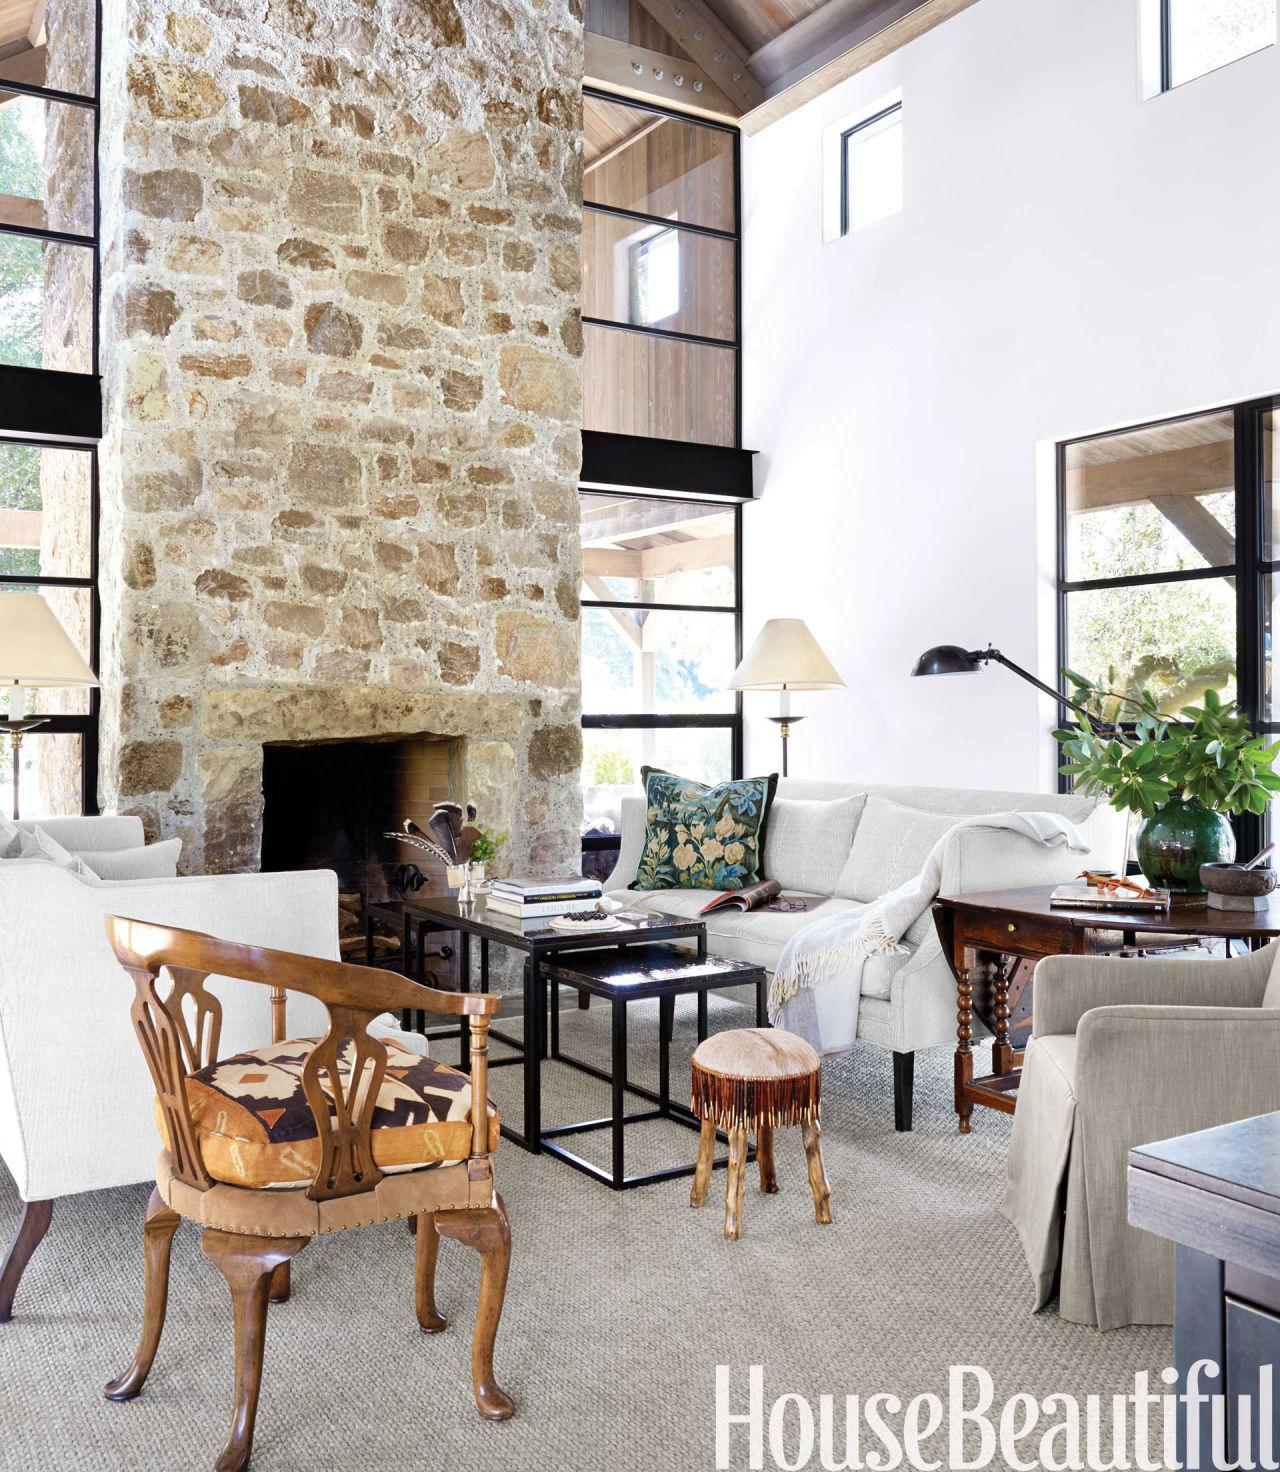 Modern Natural Stone : Natural modern house barn style